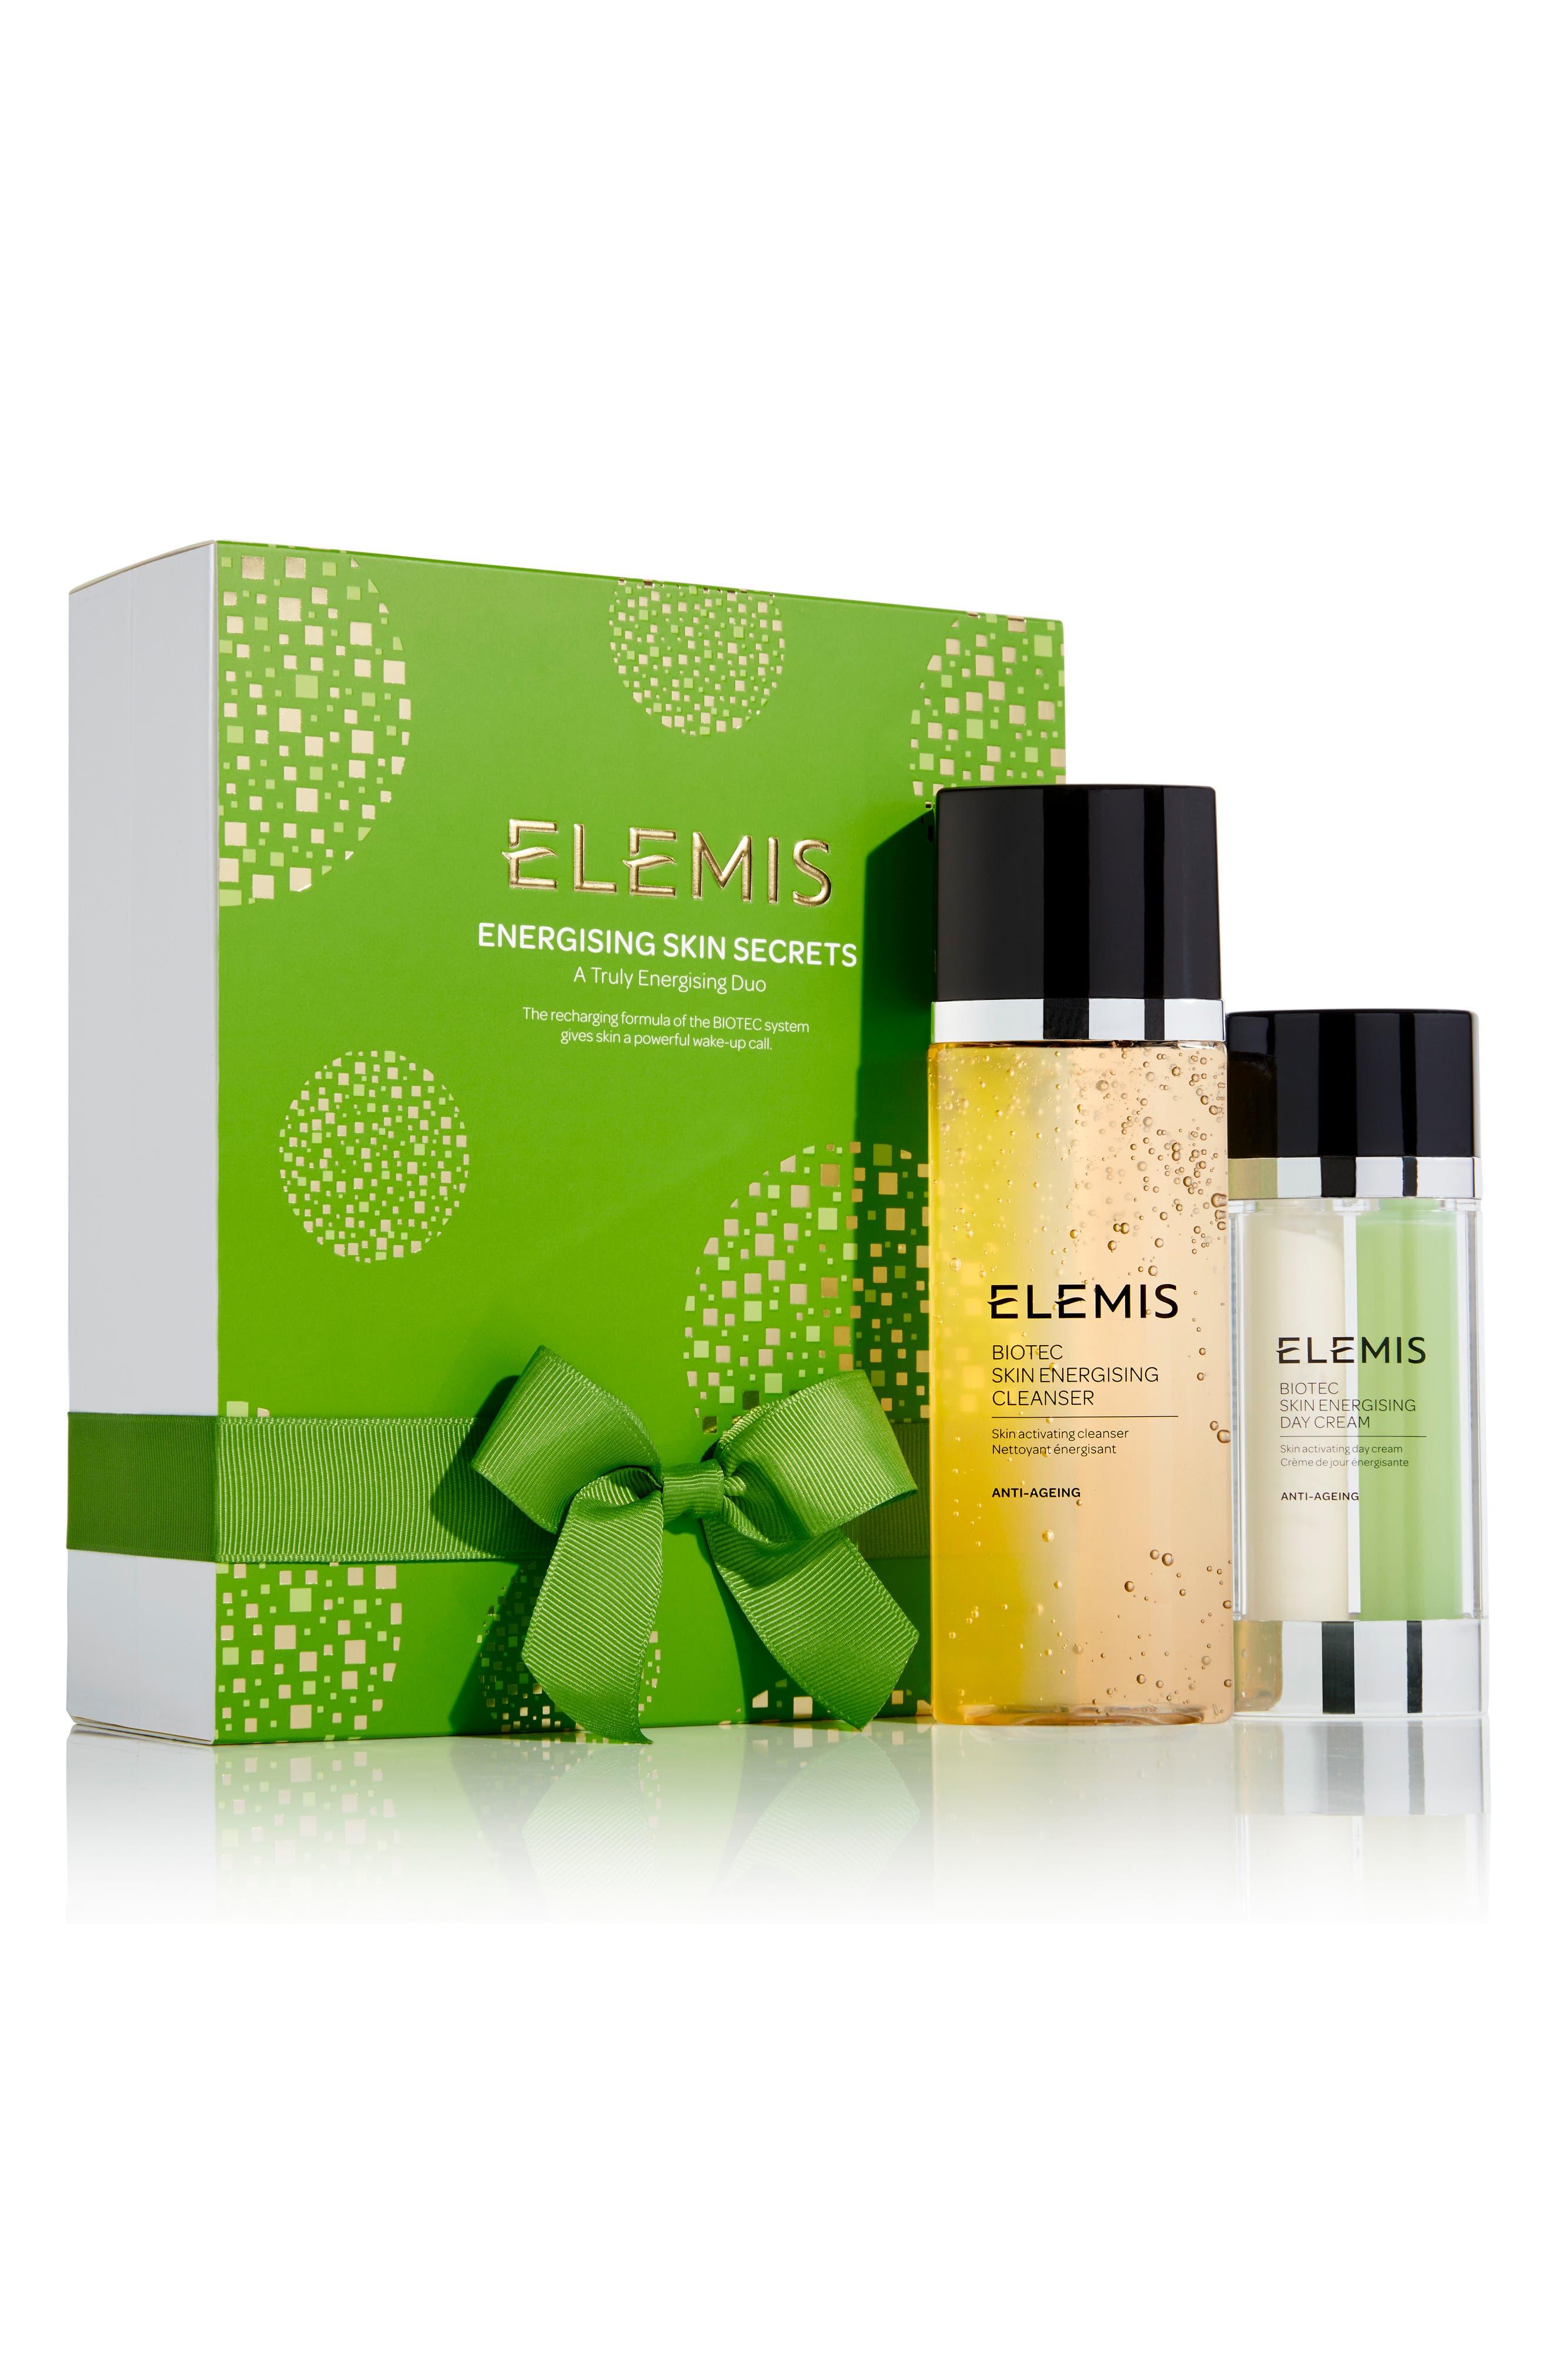 Elemis Energising Skin Secrets (Limited Edition) ($183.50 Value)